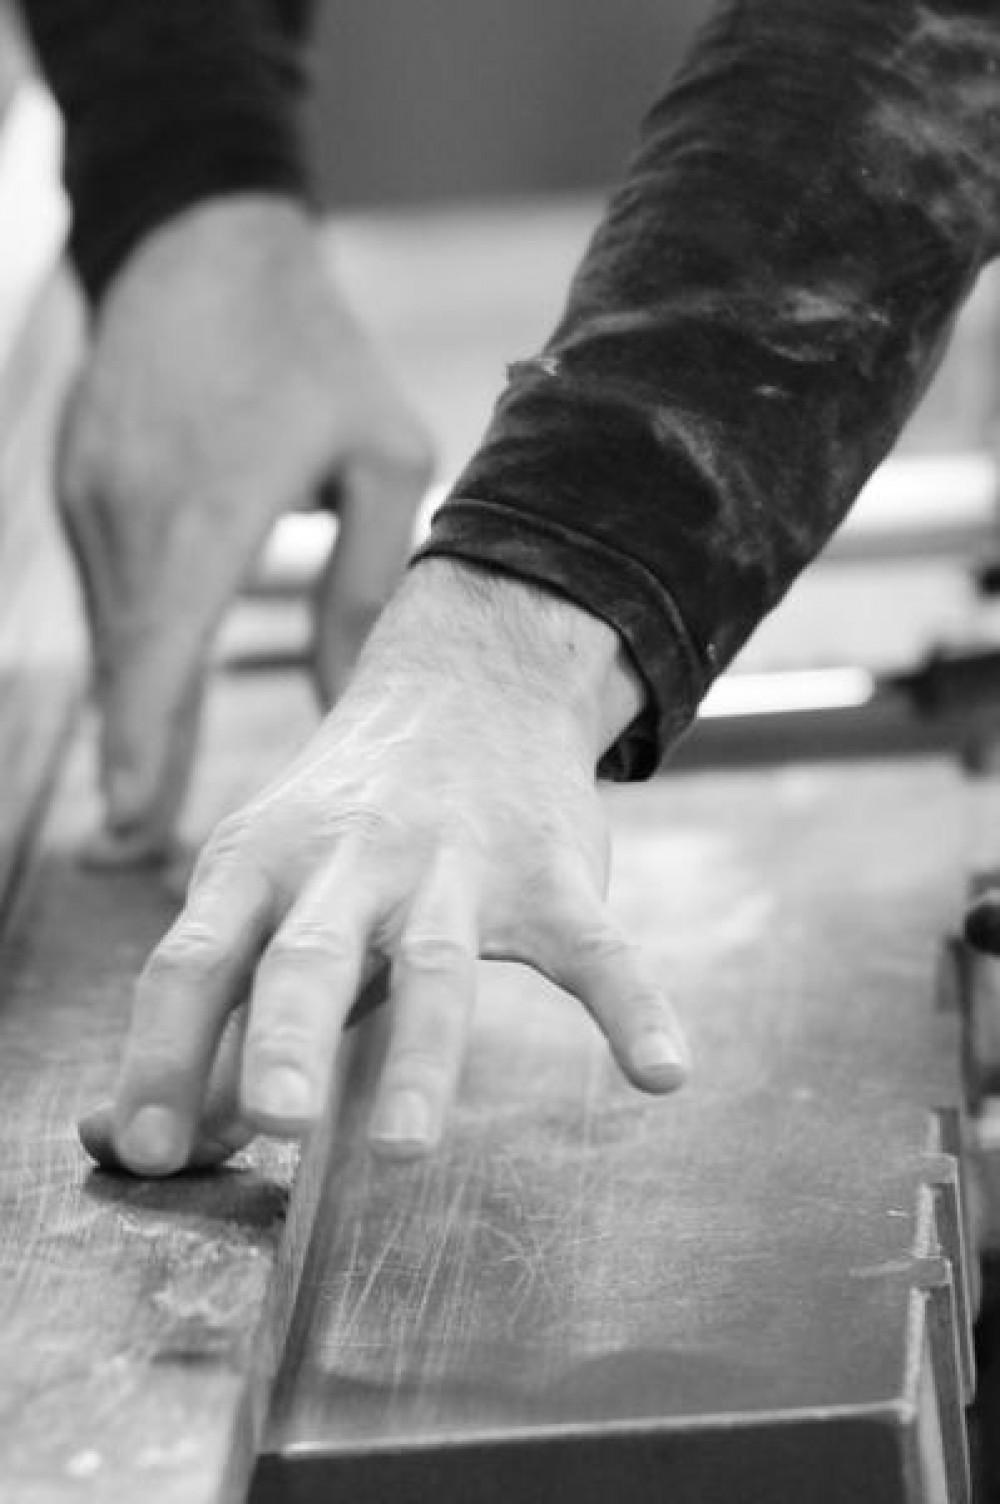 handmade craft handcrafter artisanat